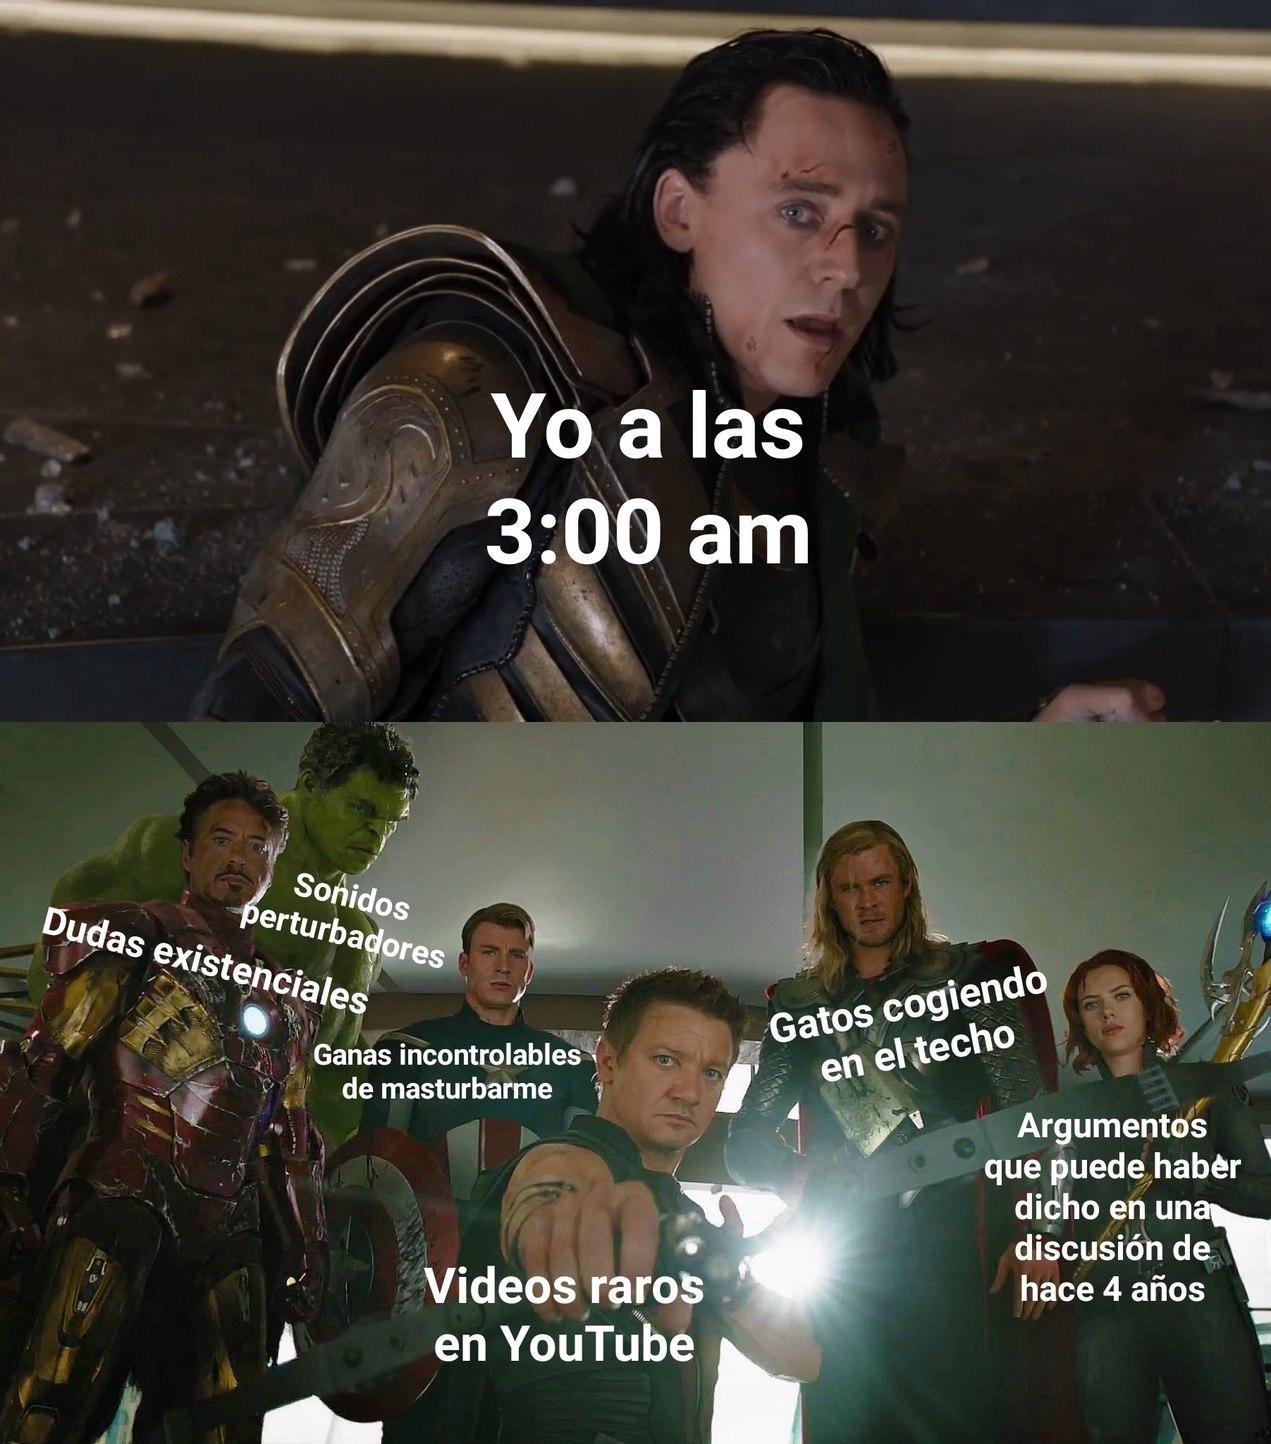 Ganas de dormir lpm - meme